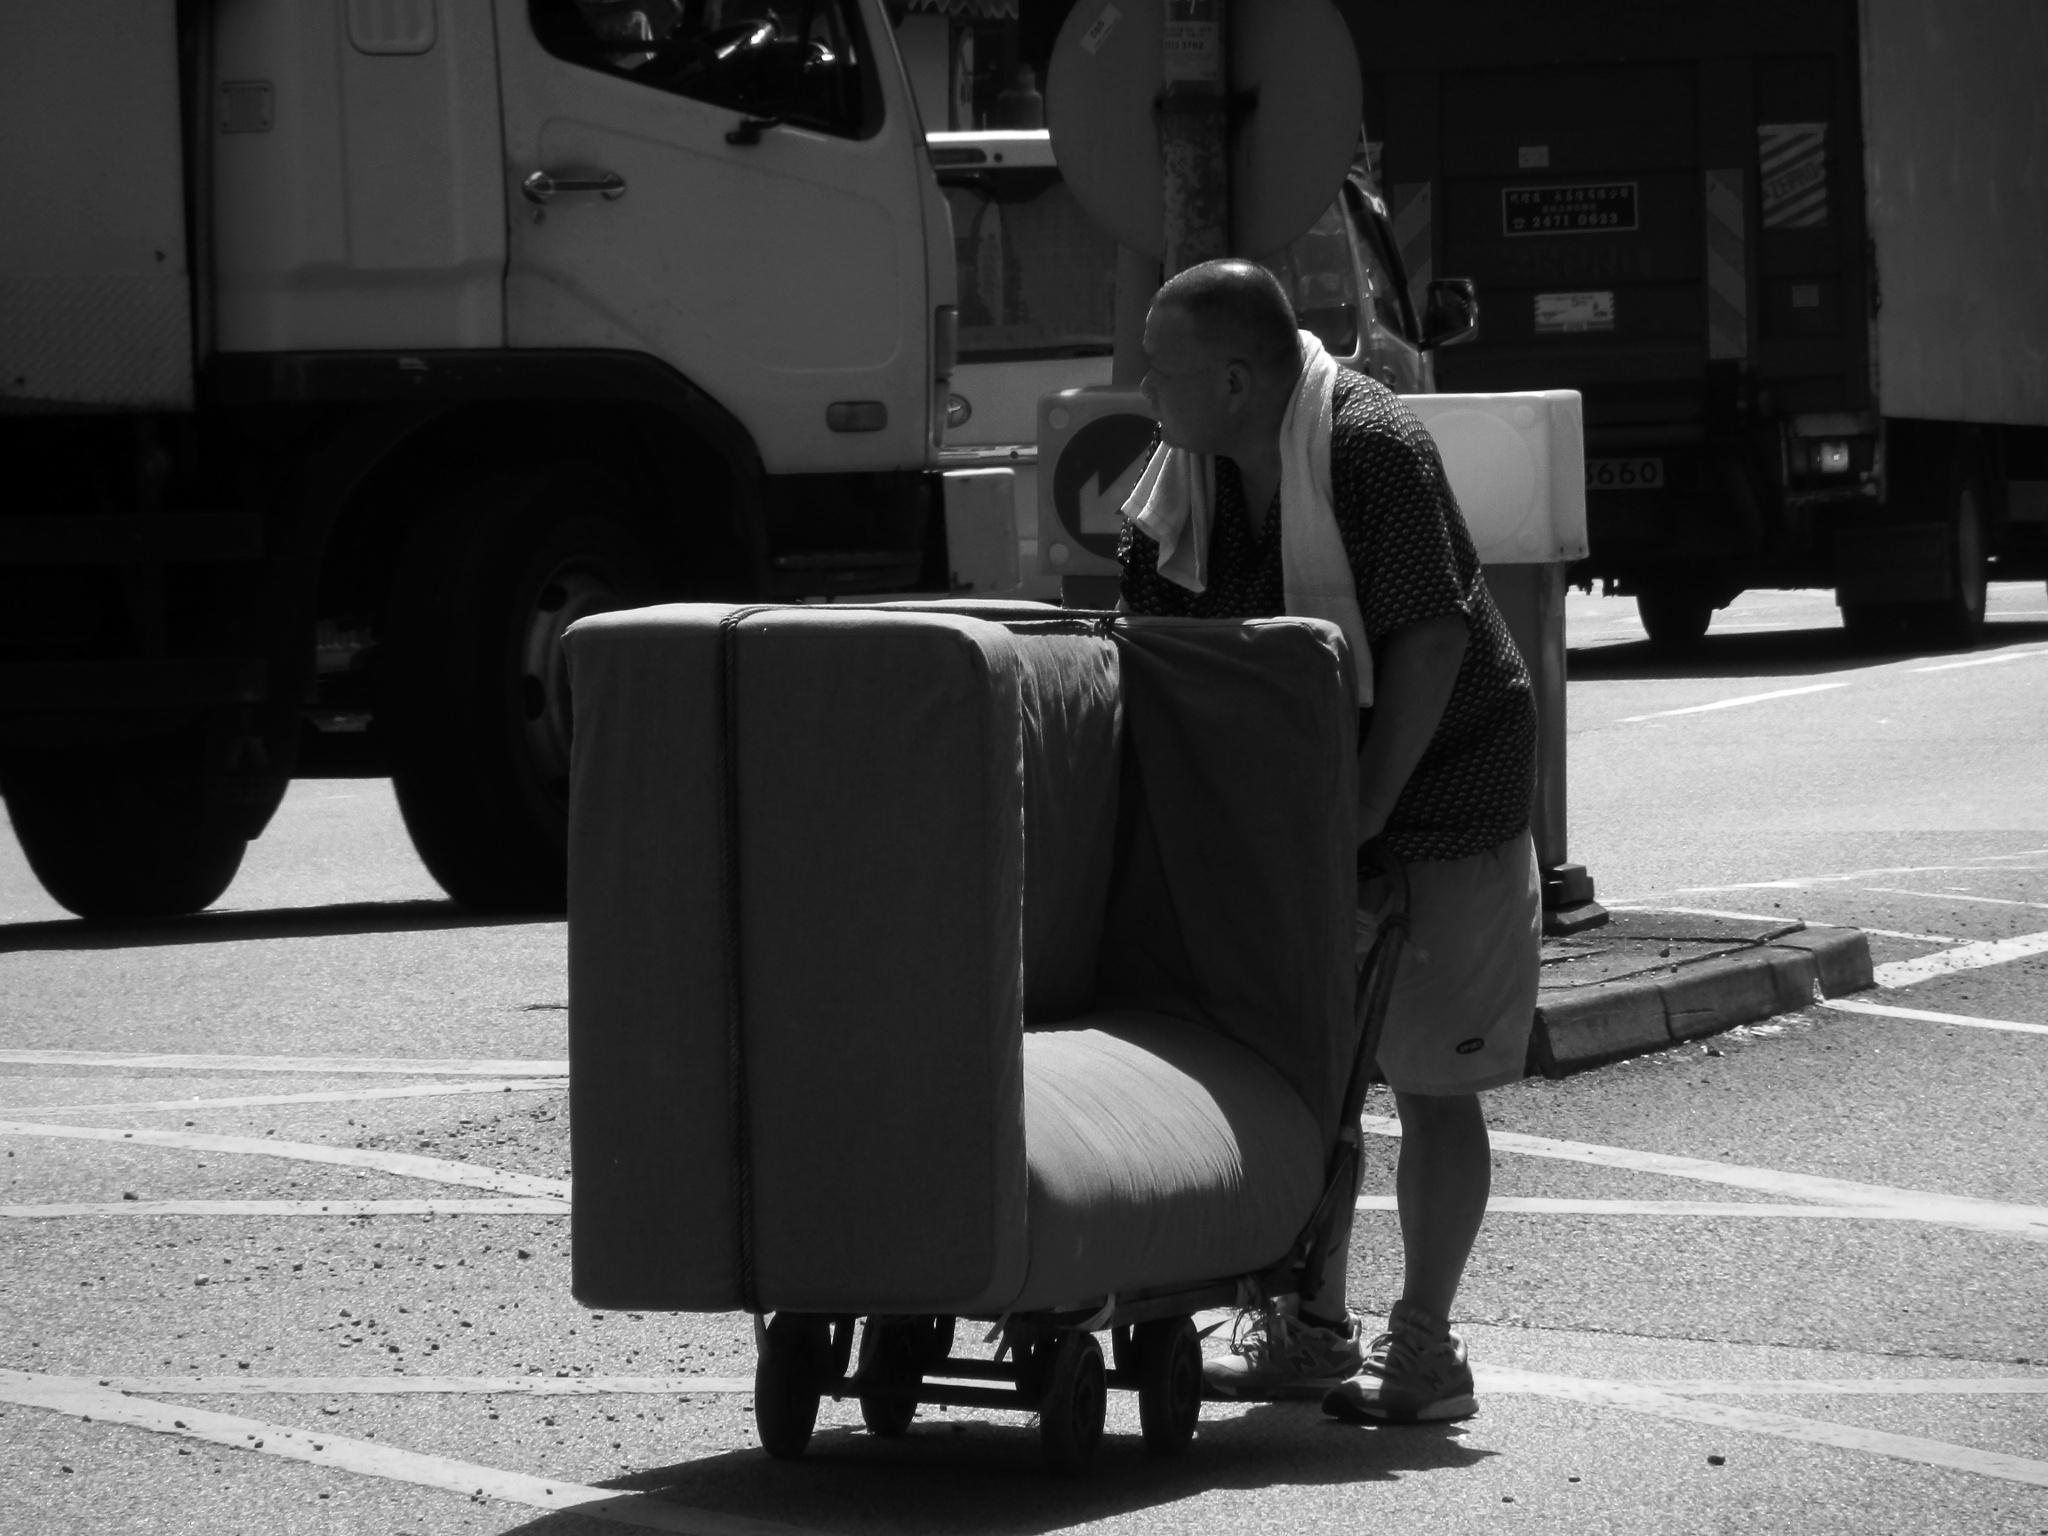 ...moving sofa... by cyccanhk